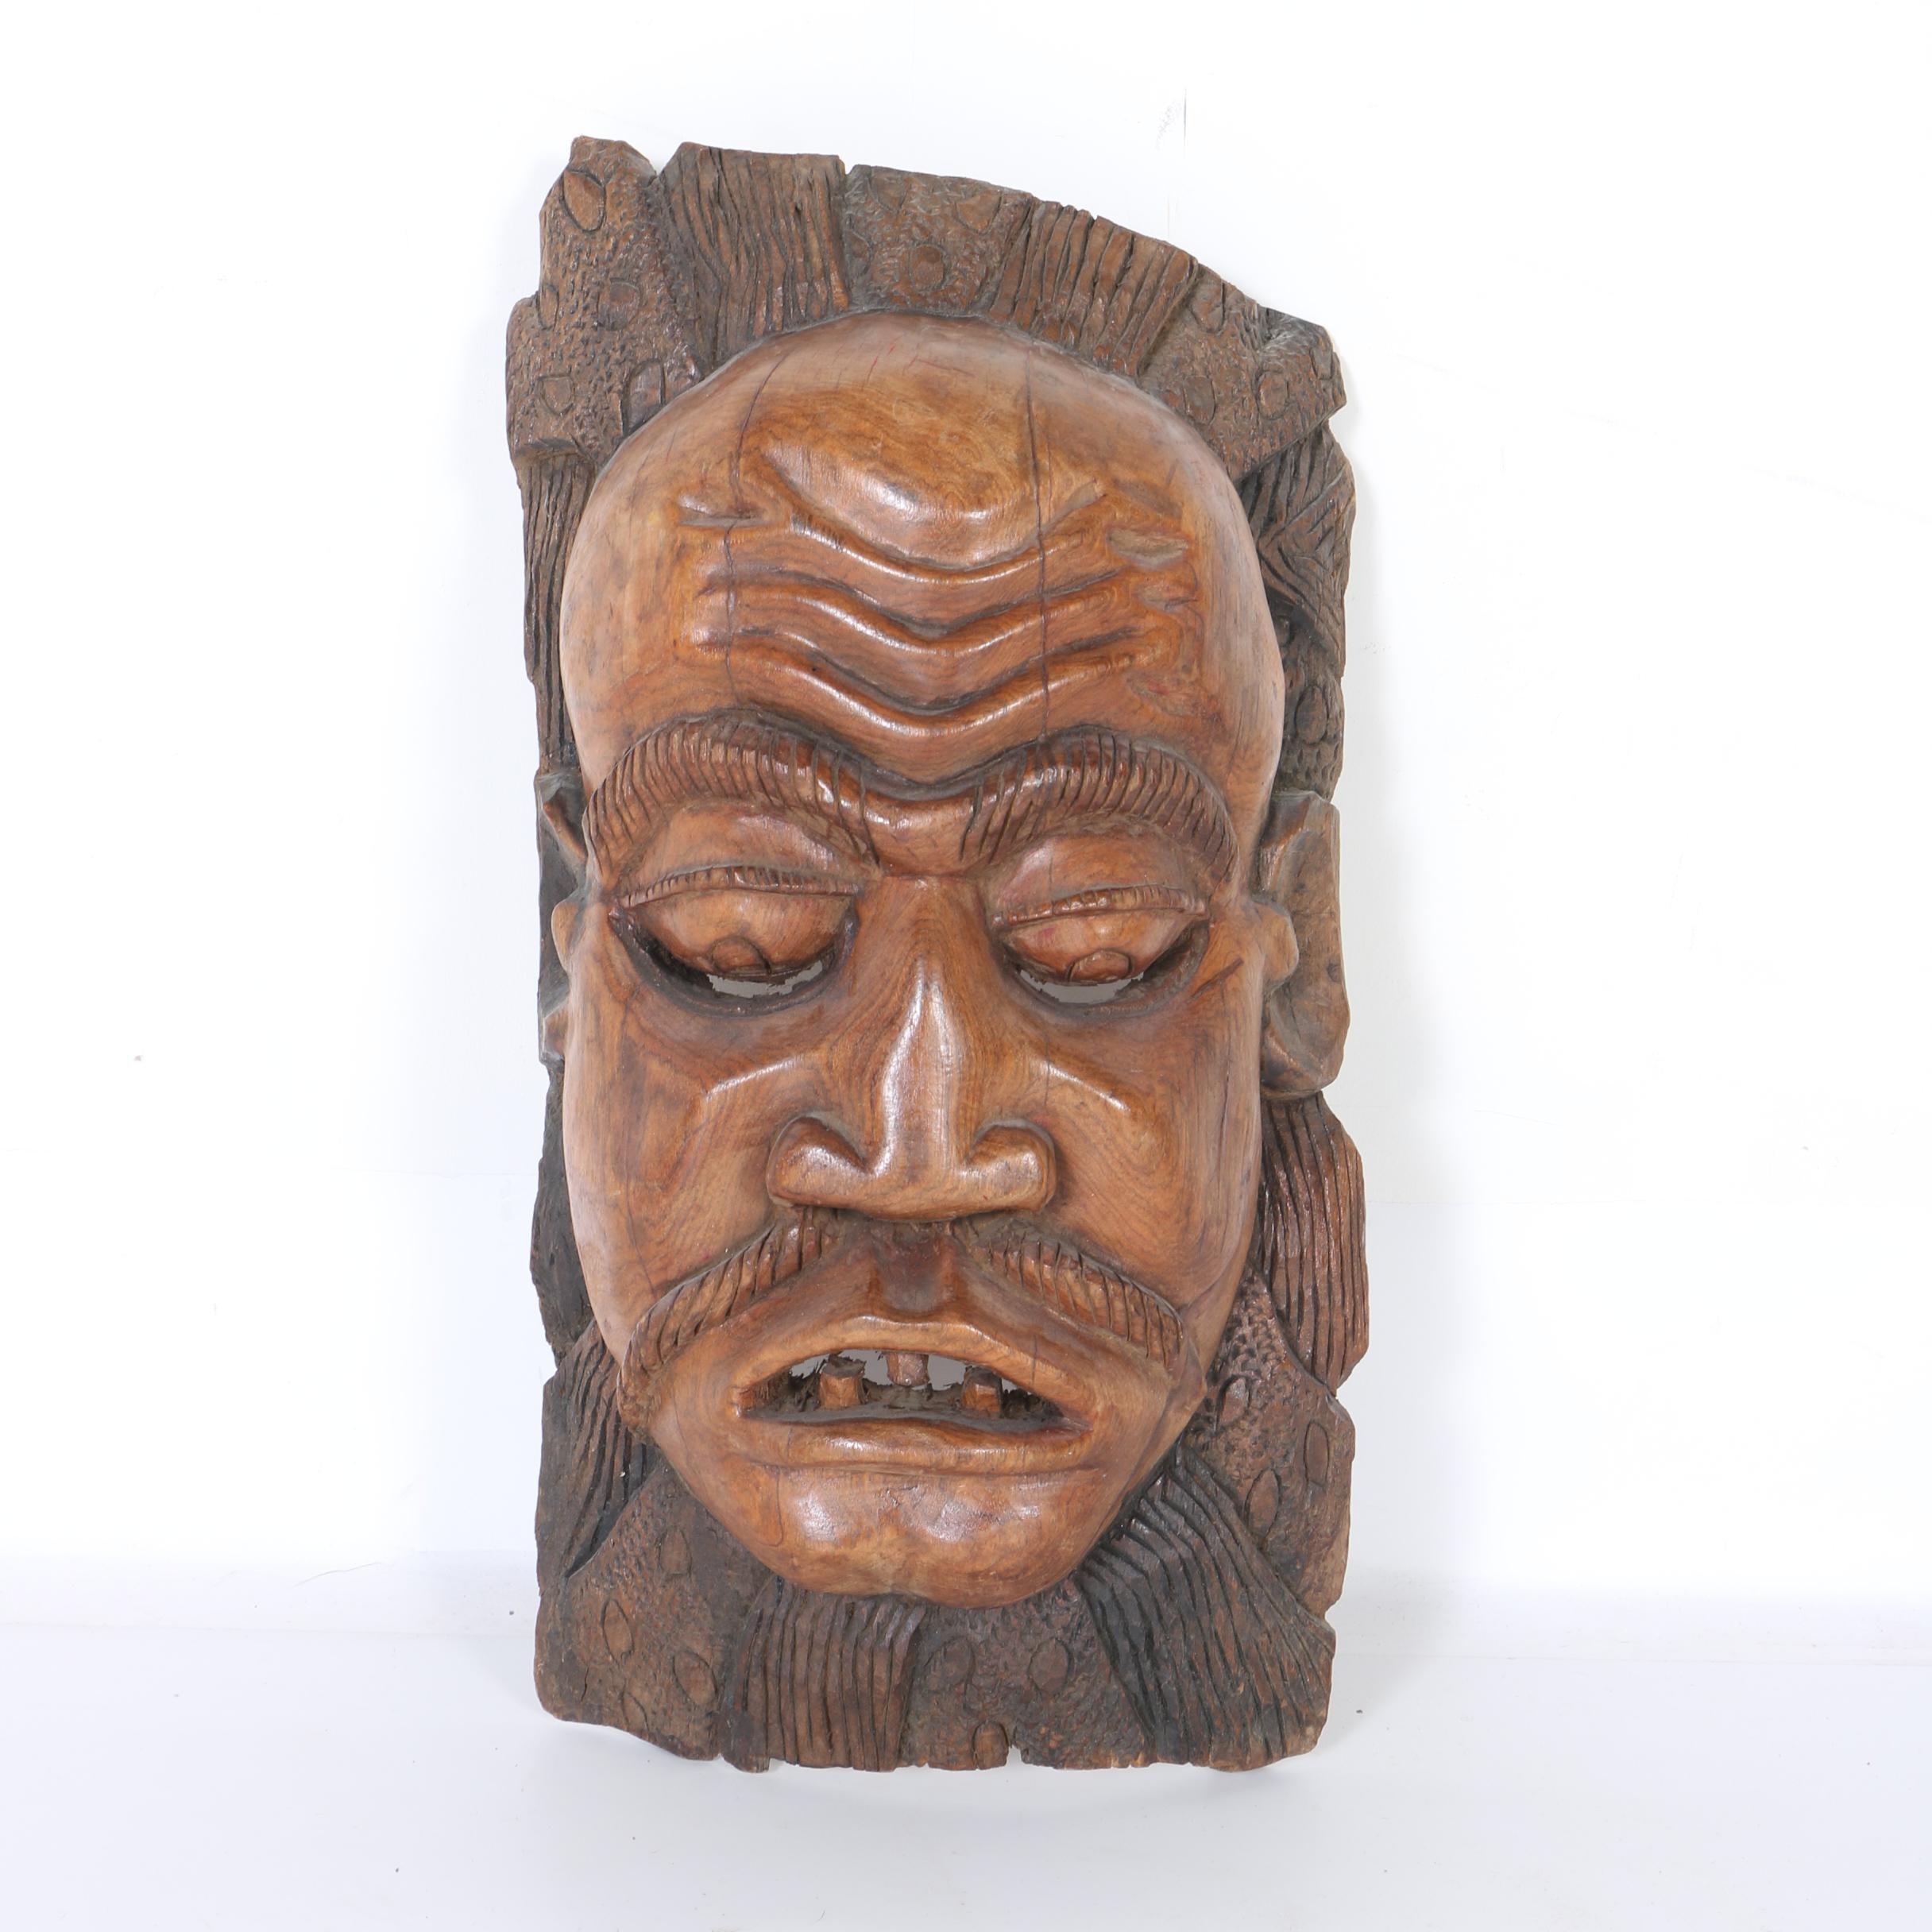 Nigerian Carved Wood Mask